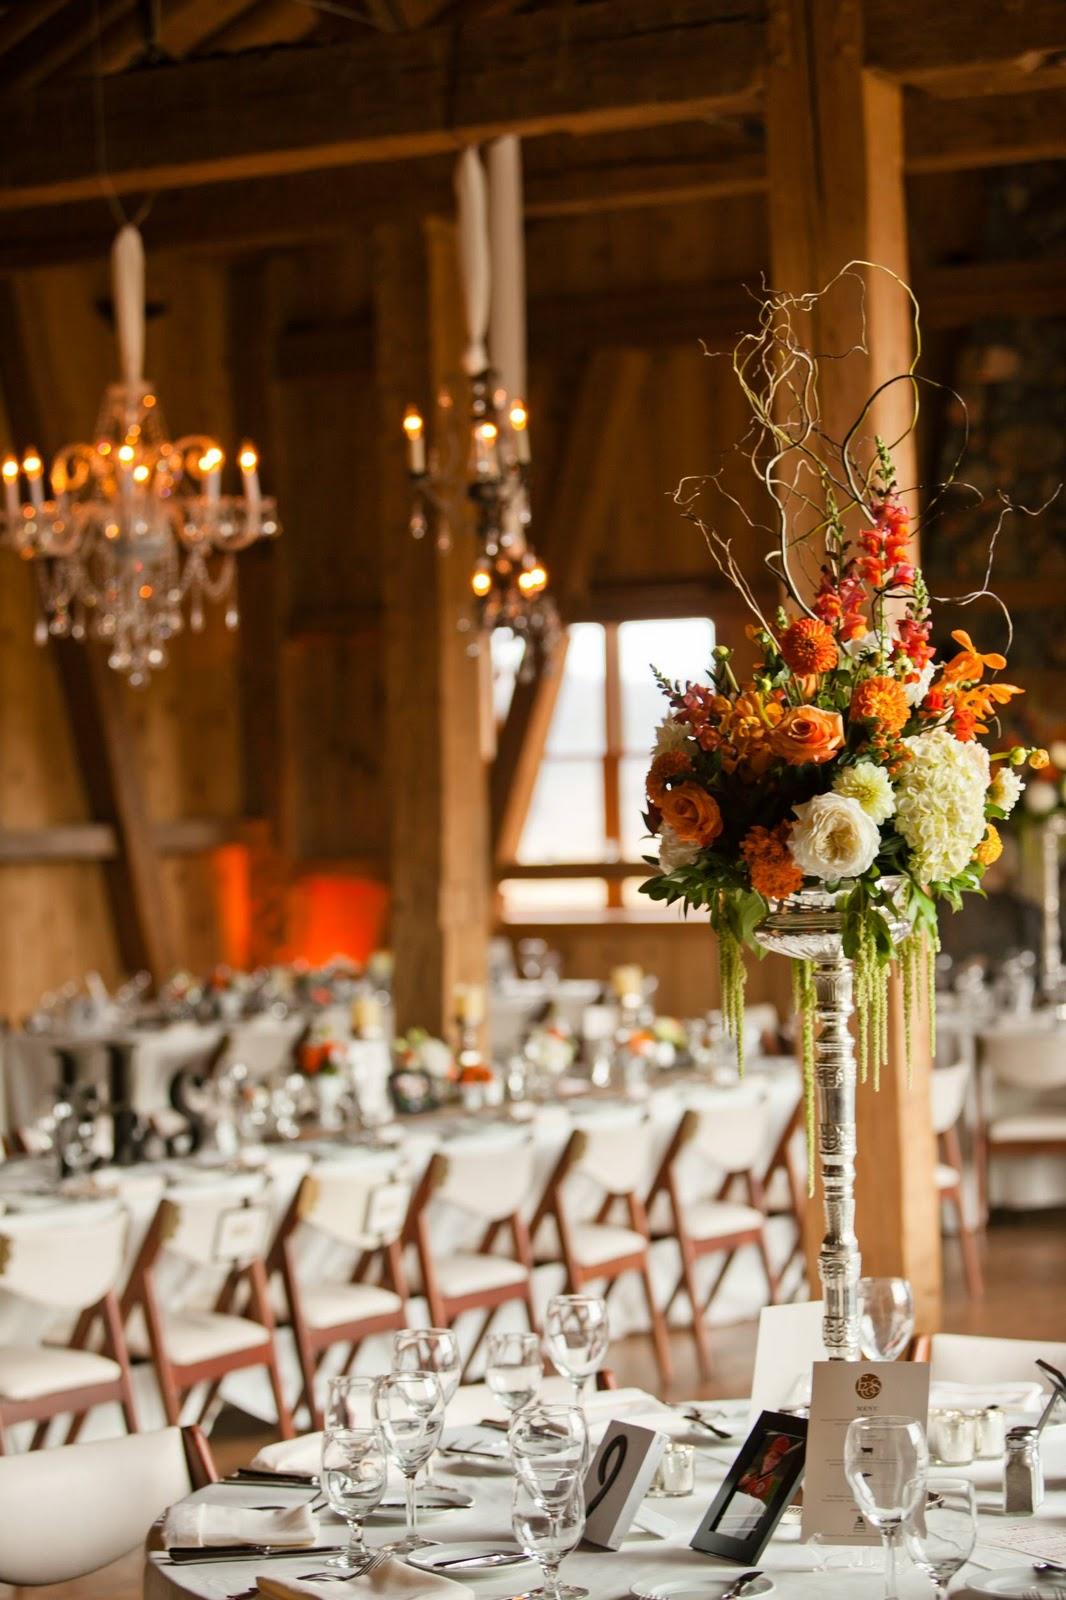 TRENDS WEDDING: {Real Wedding} Rustic VintageWedding ...